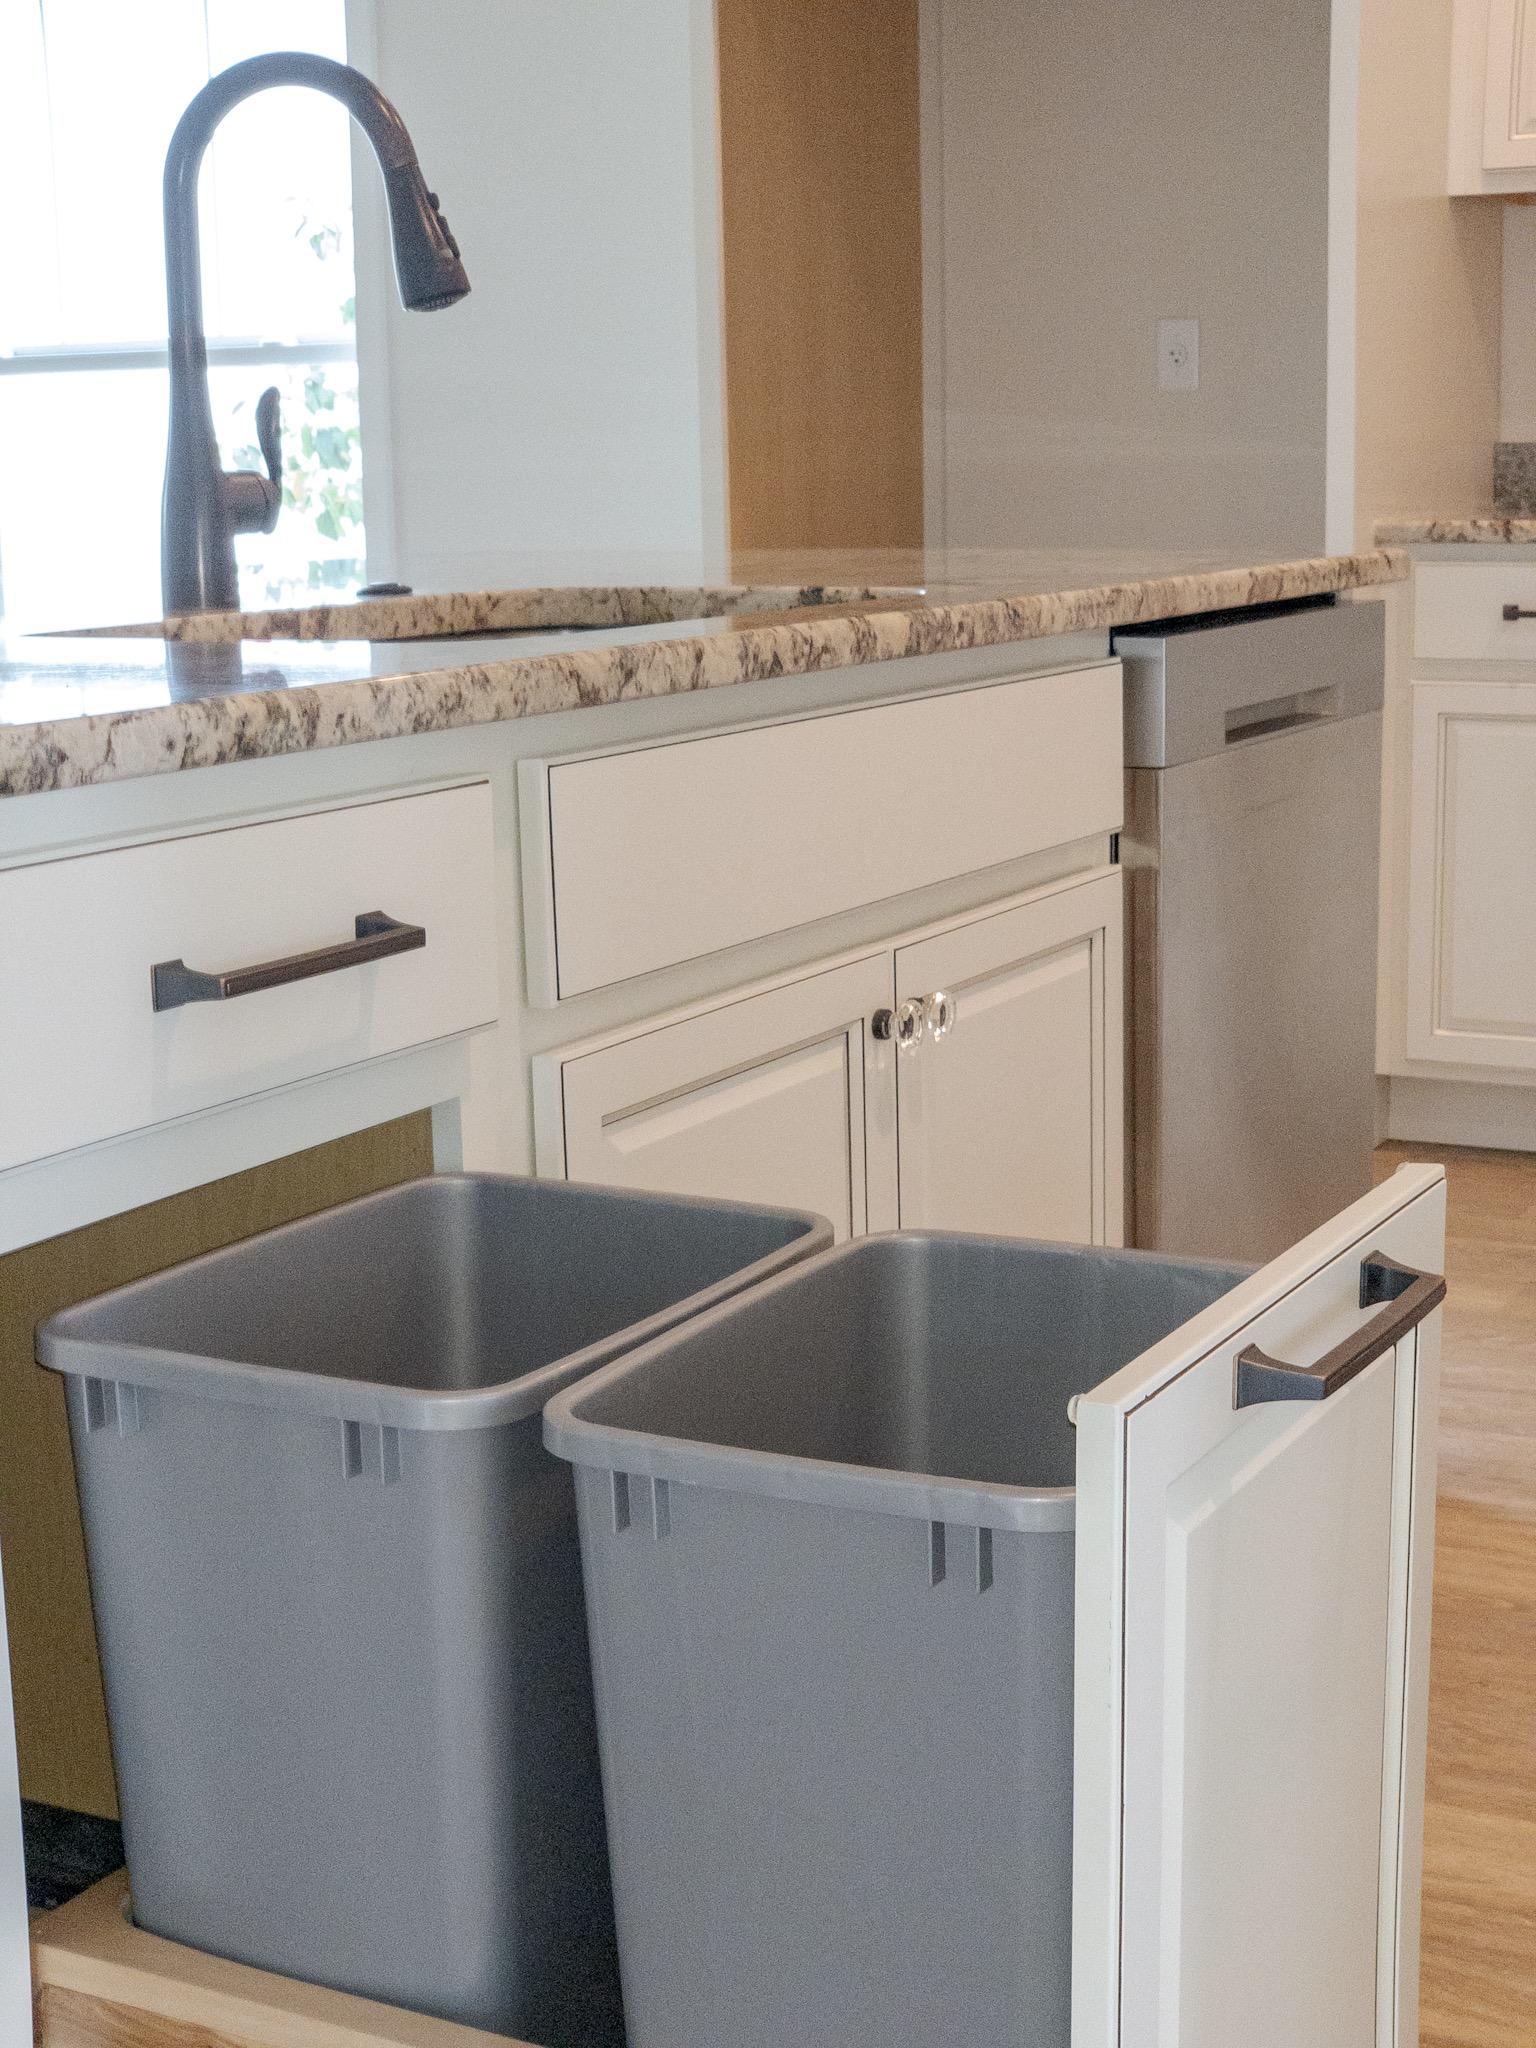 Kitchen Trash and Recycle Bins.jpg